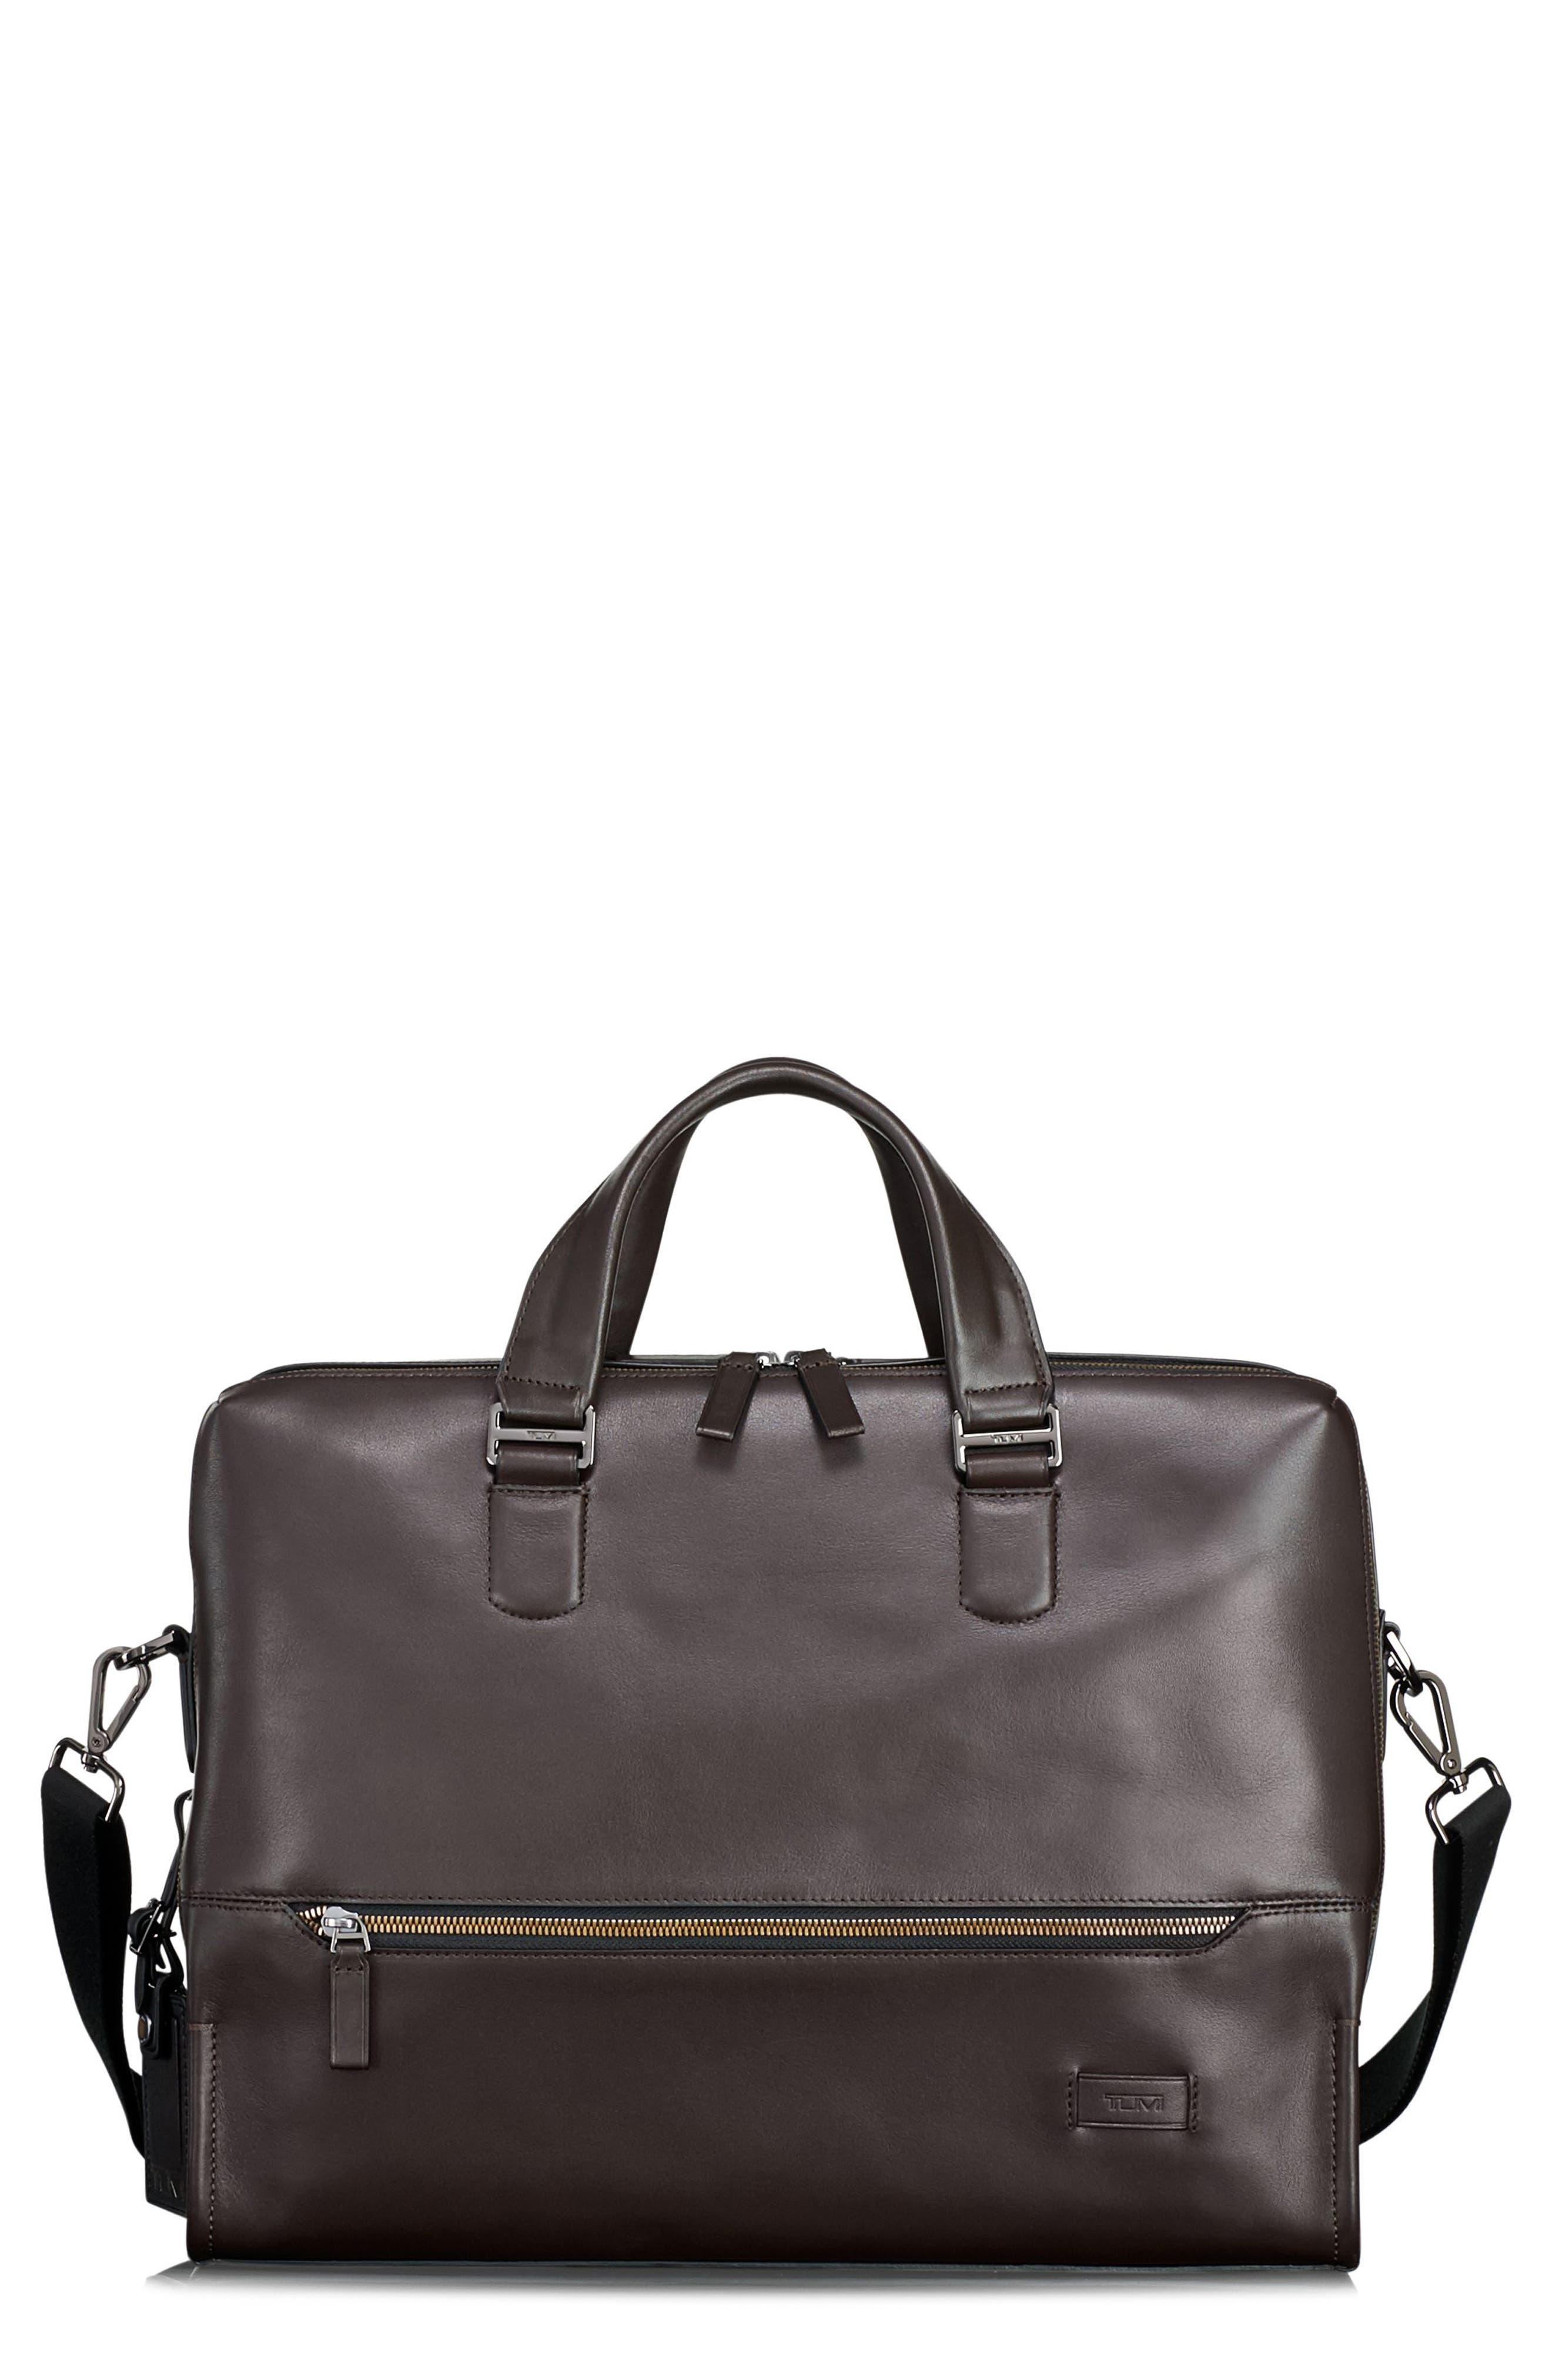 TUMI Harrison Horton Double Zip Leather Briefcase